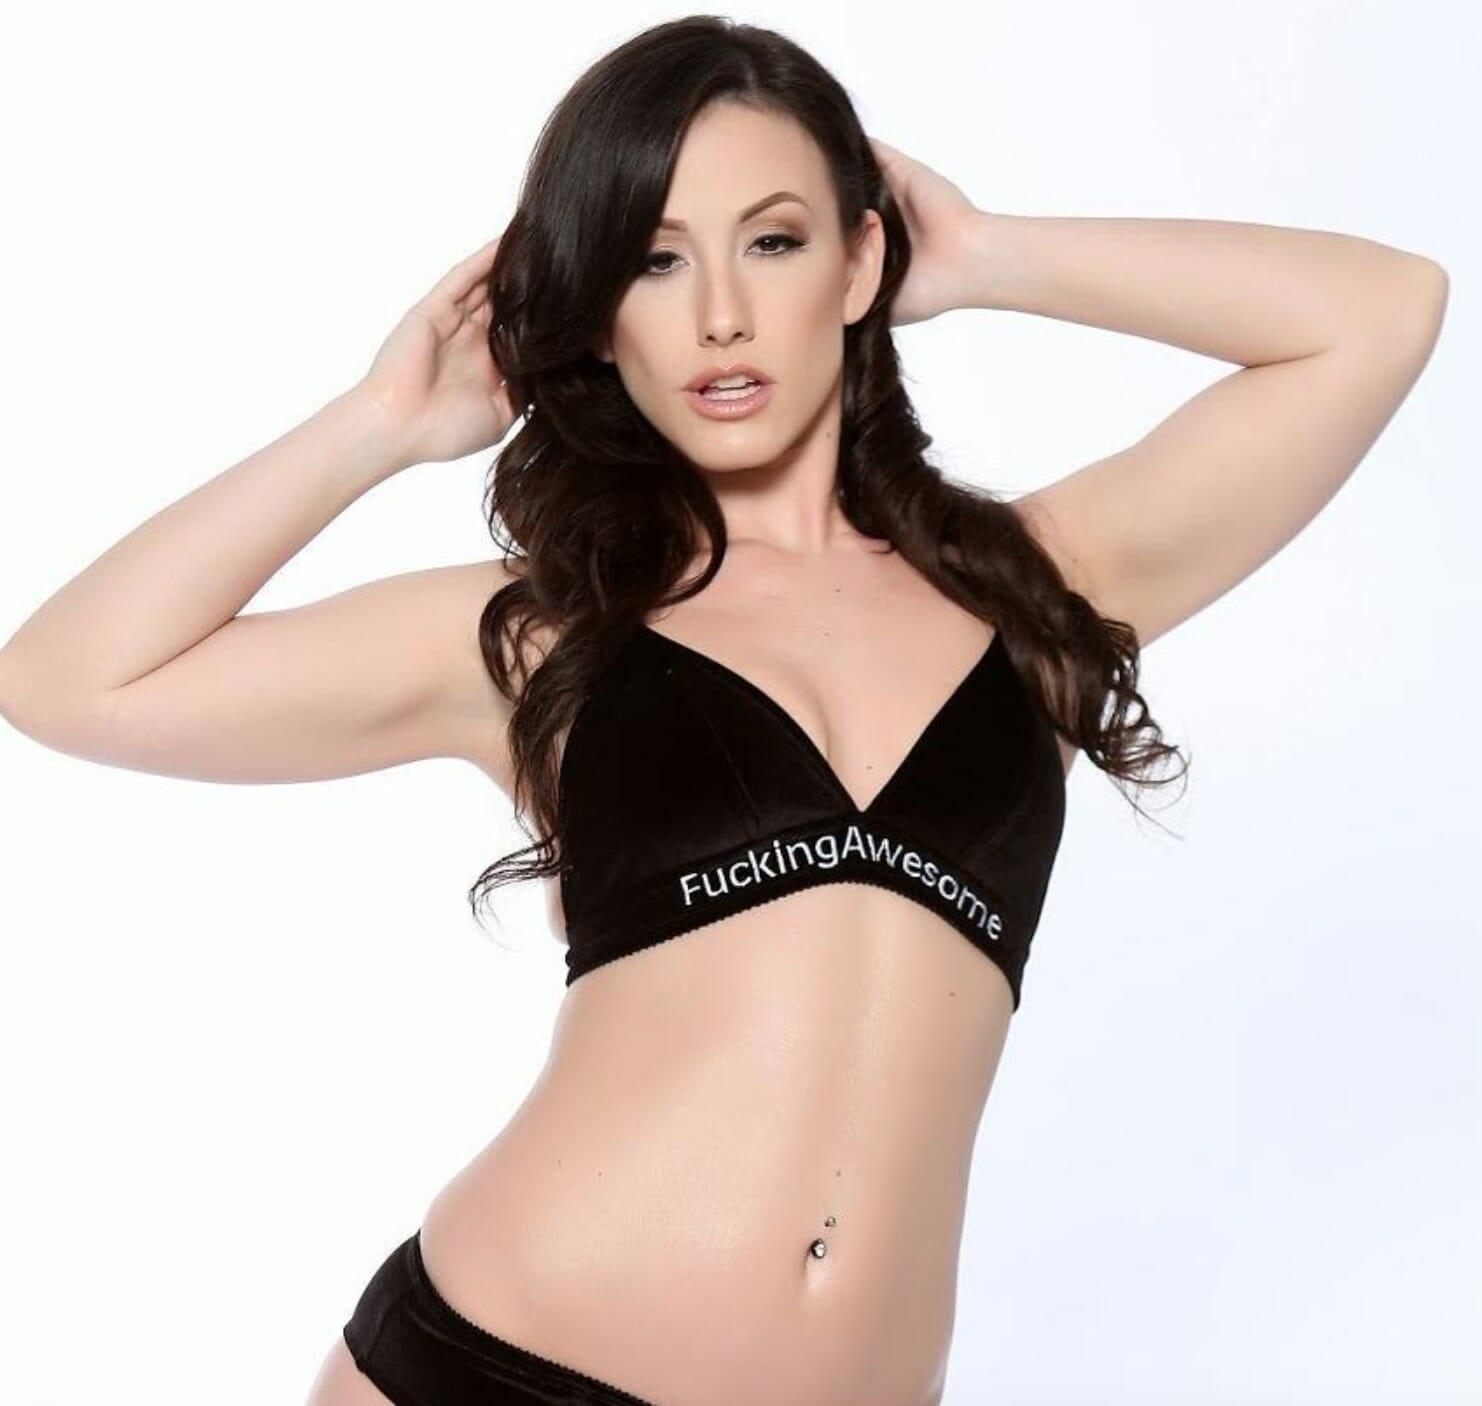 Top hd porn sites reddit